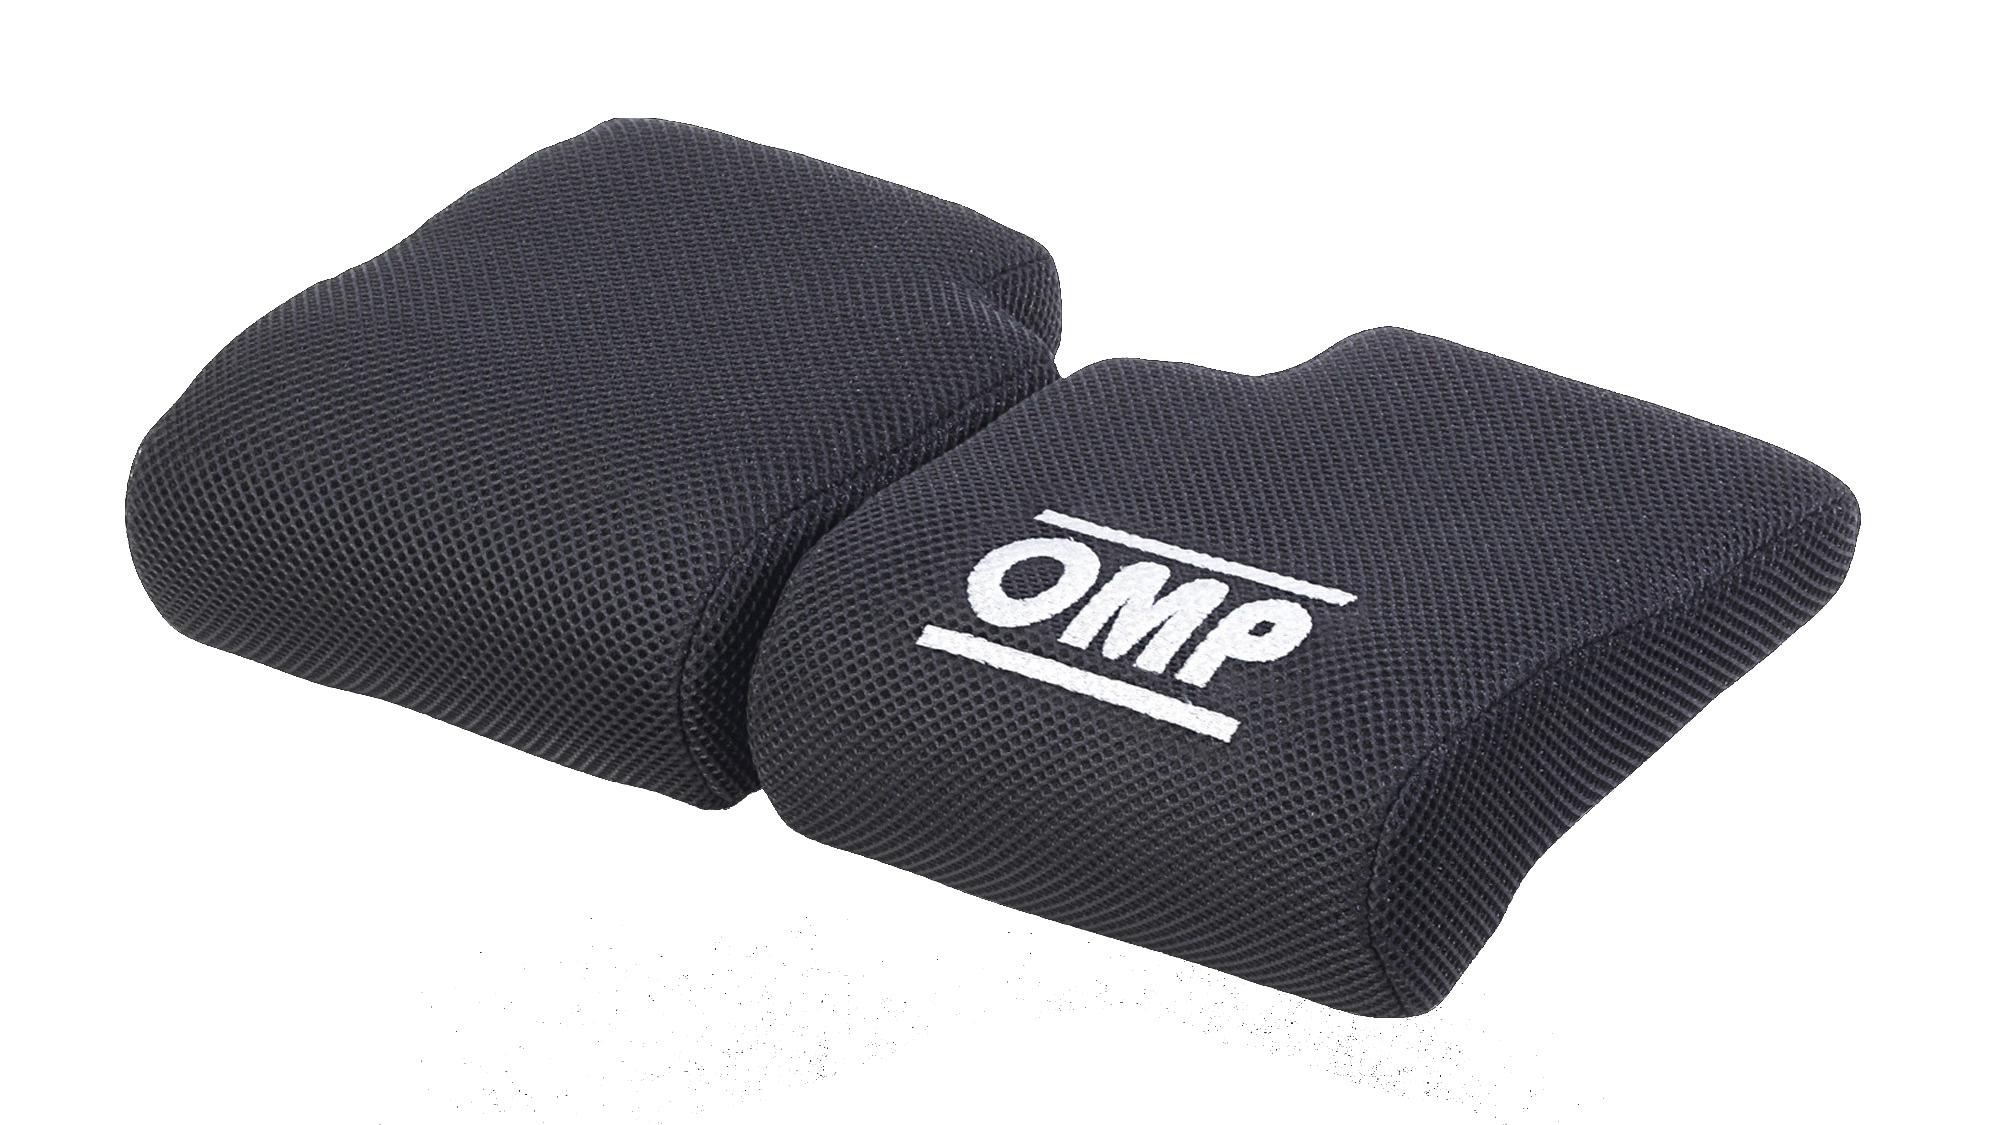 Double Leg Seat Cushion For WRC Seats